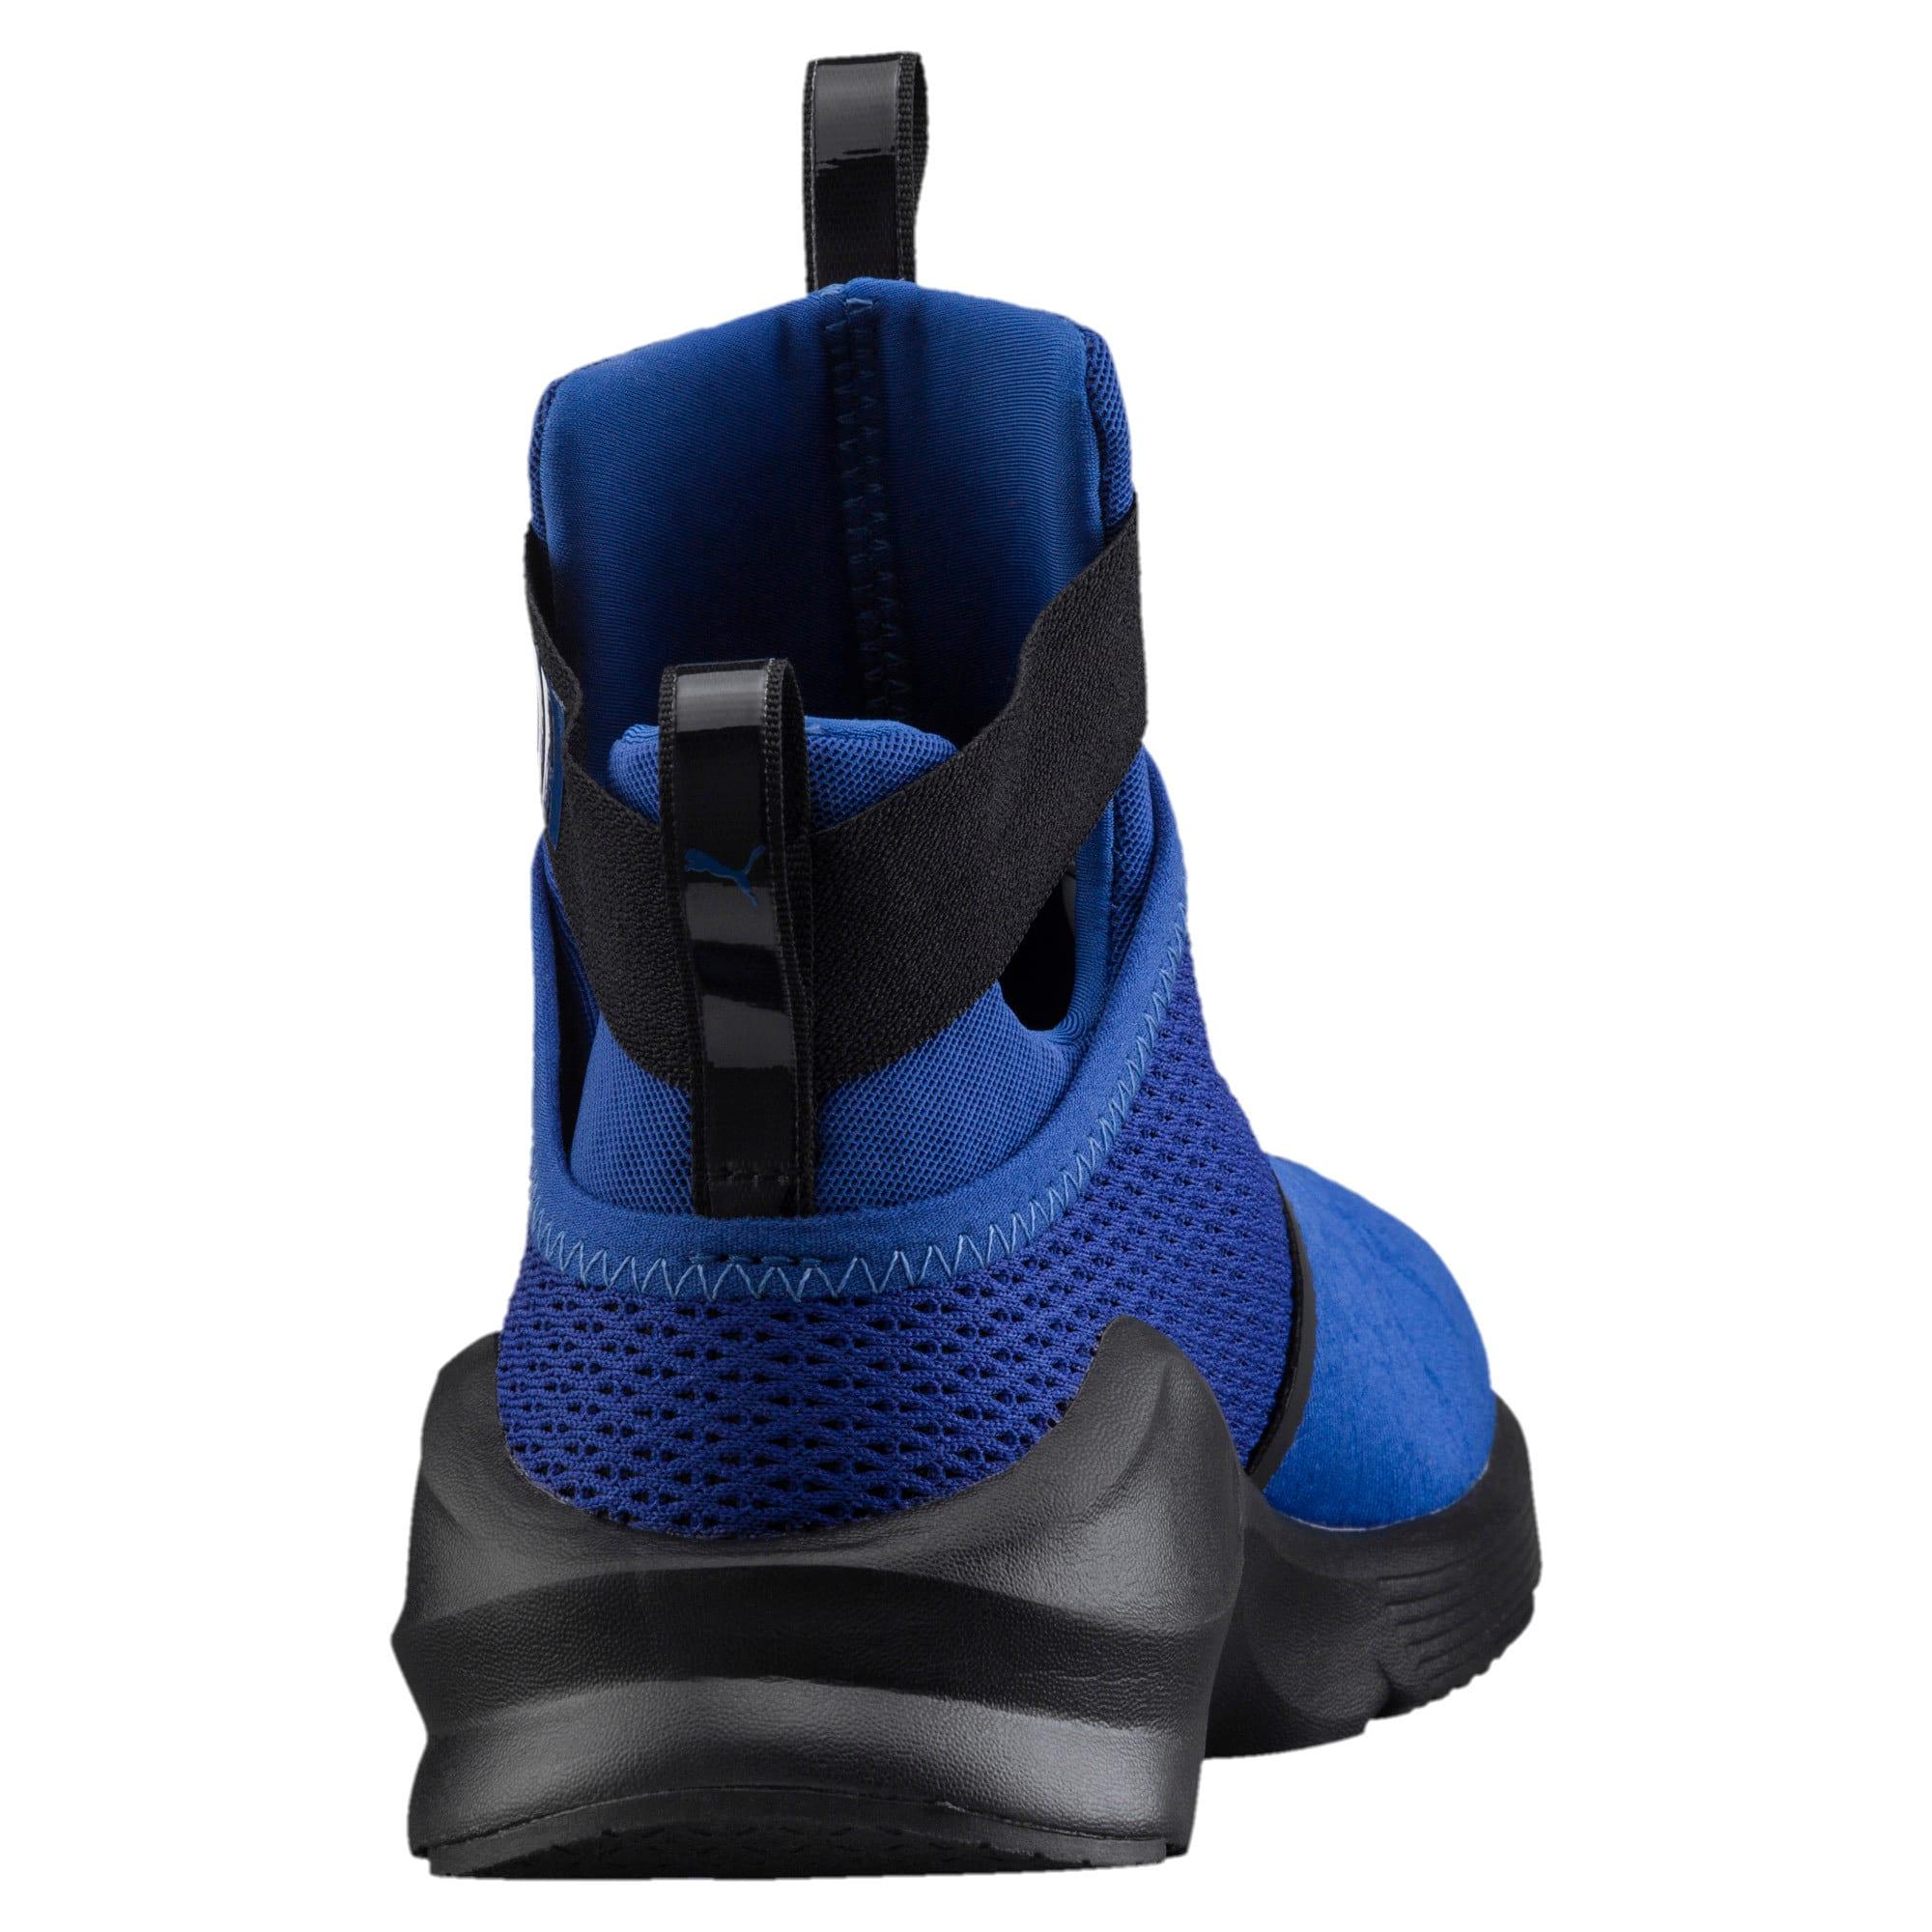 Thumbnail 3 of PUMA Fierce Strap Training Shoes, TRUE BLUE-Puma Black, medium-IND